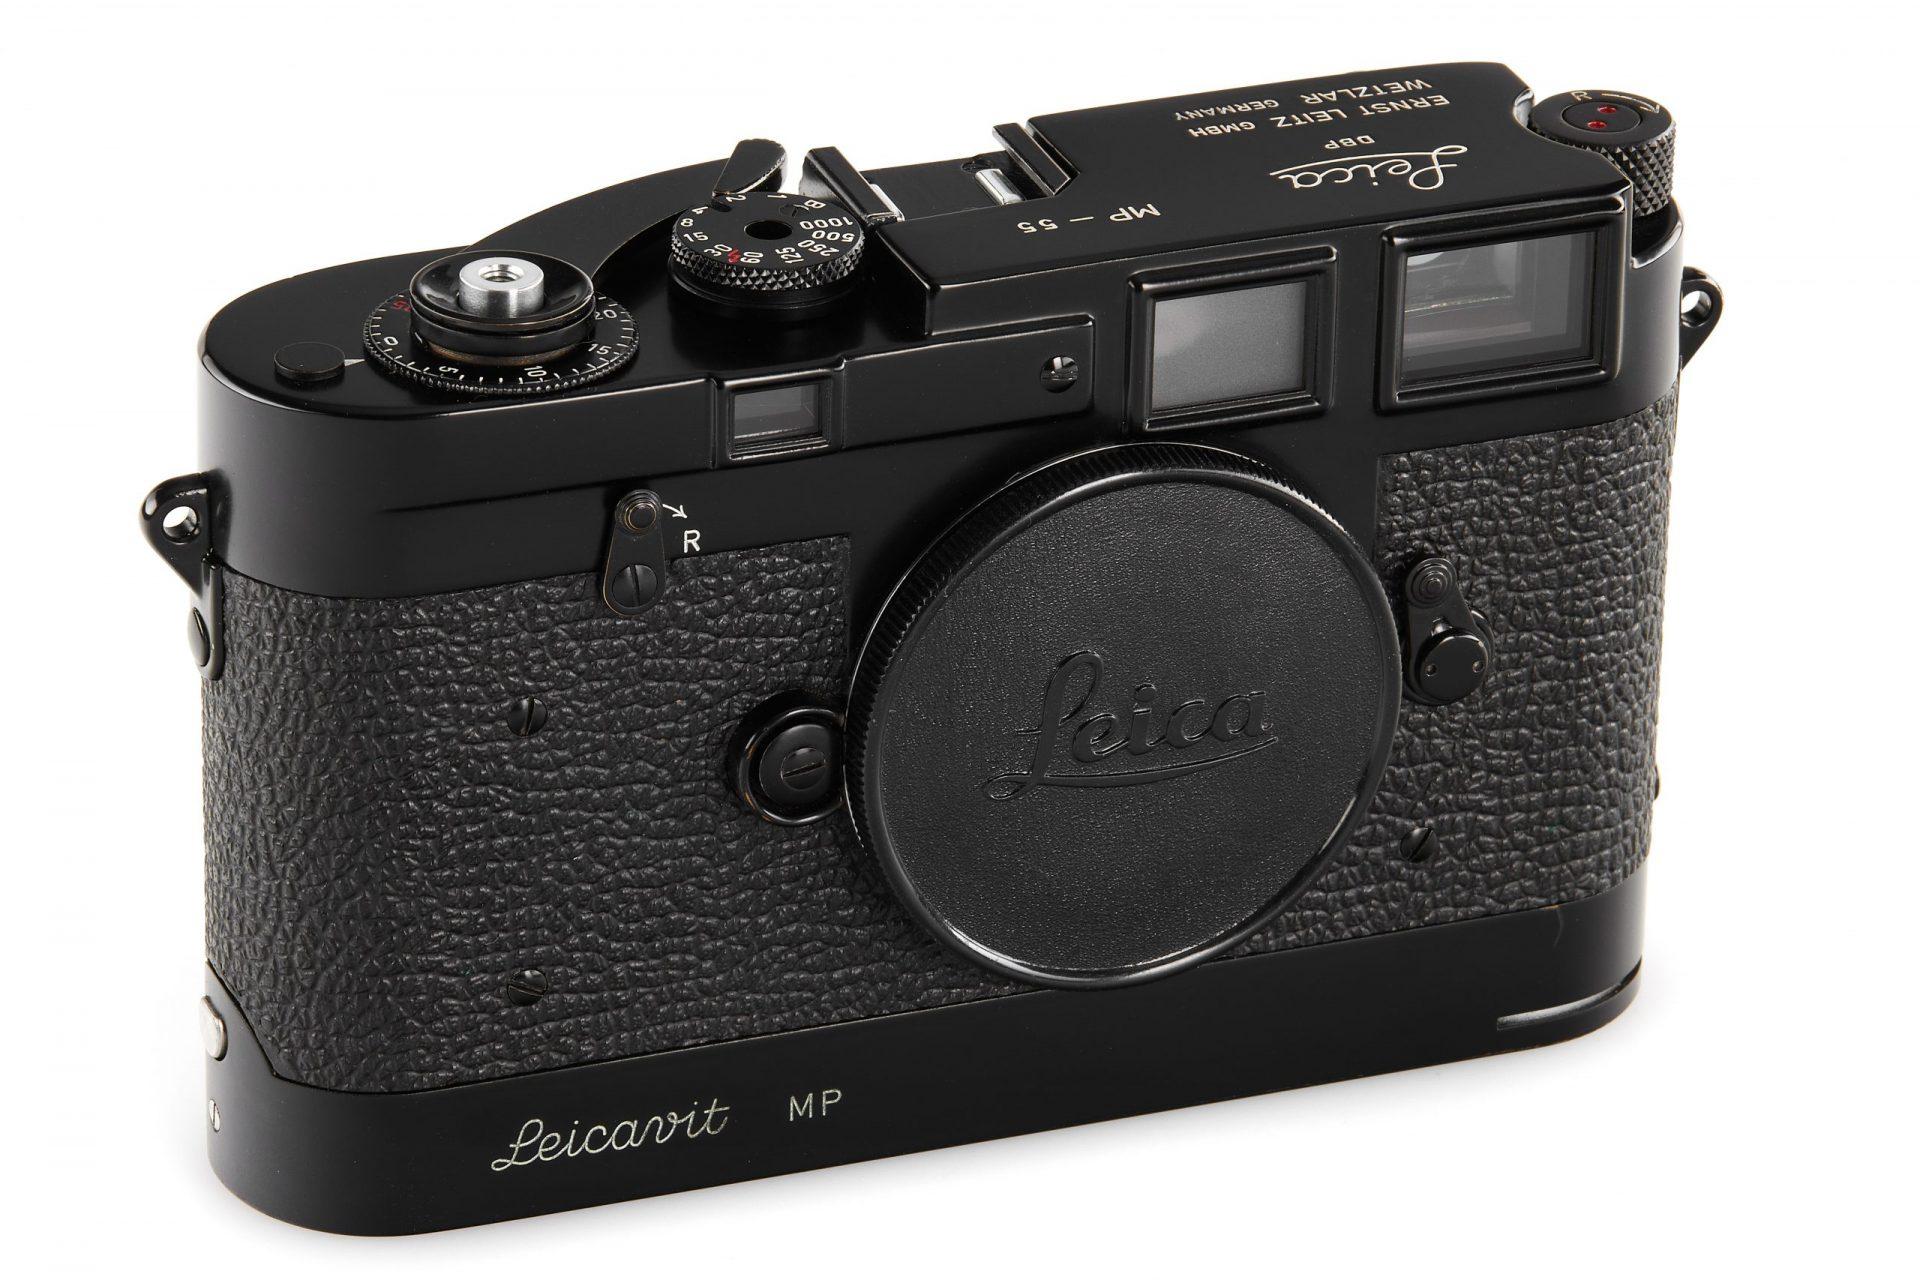 Leica MP black paint